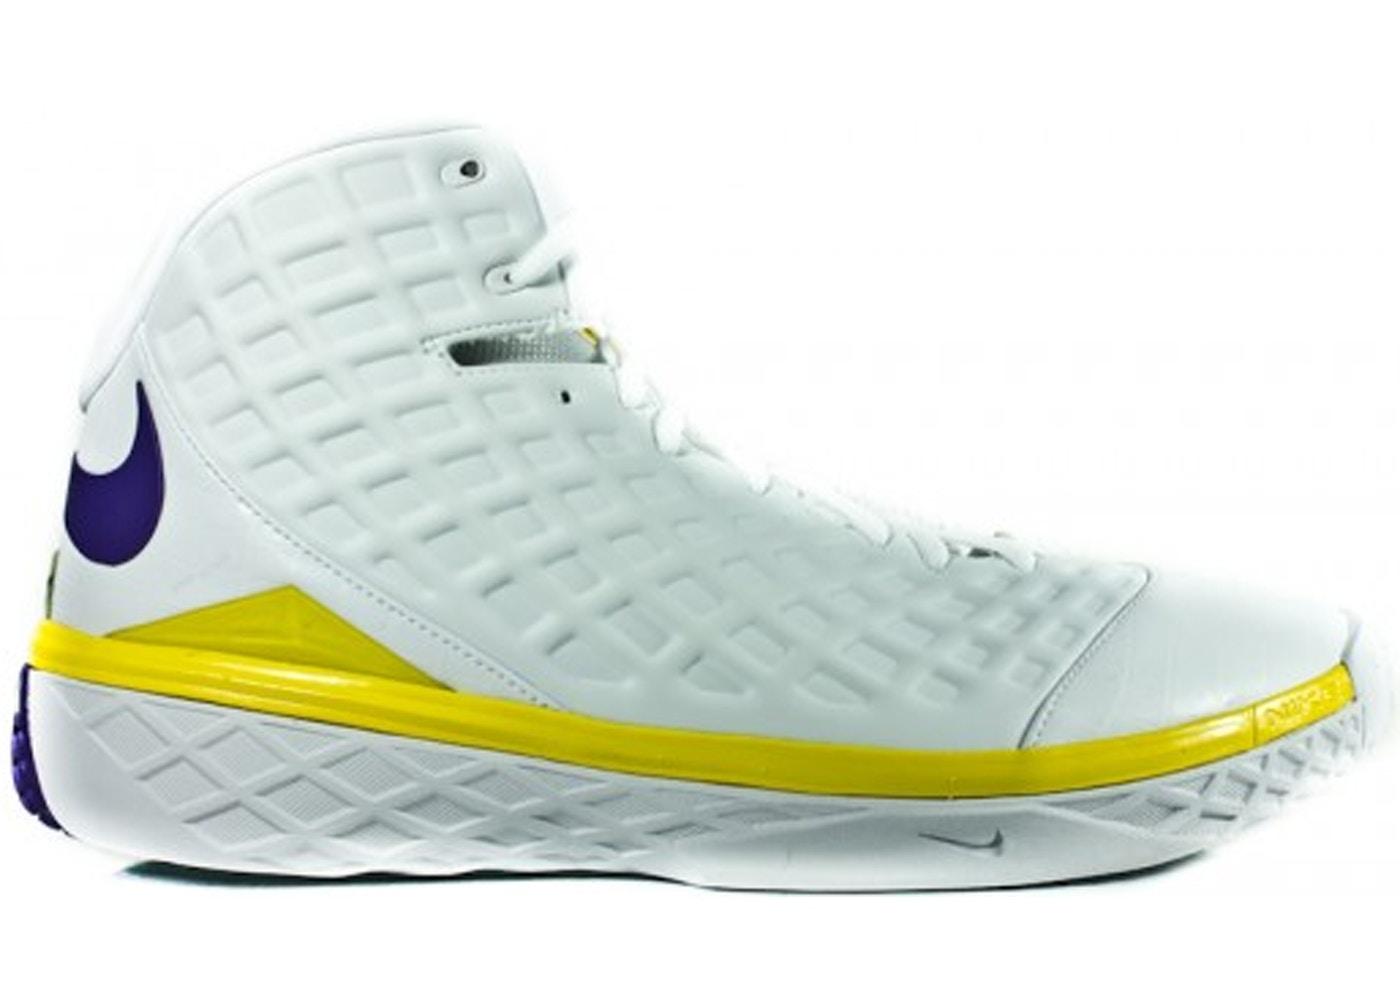 Nike Kobe 3 SL MVP - 318695-151